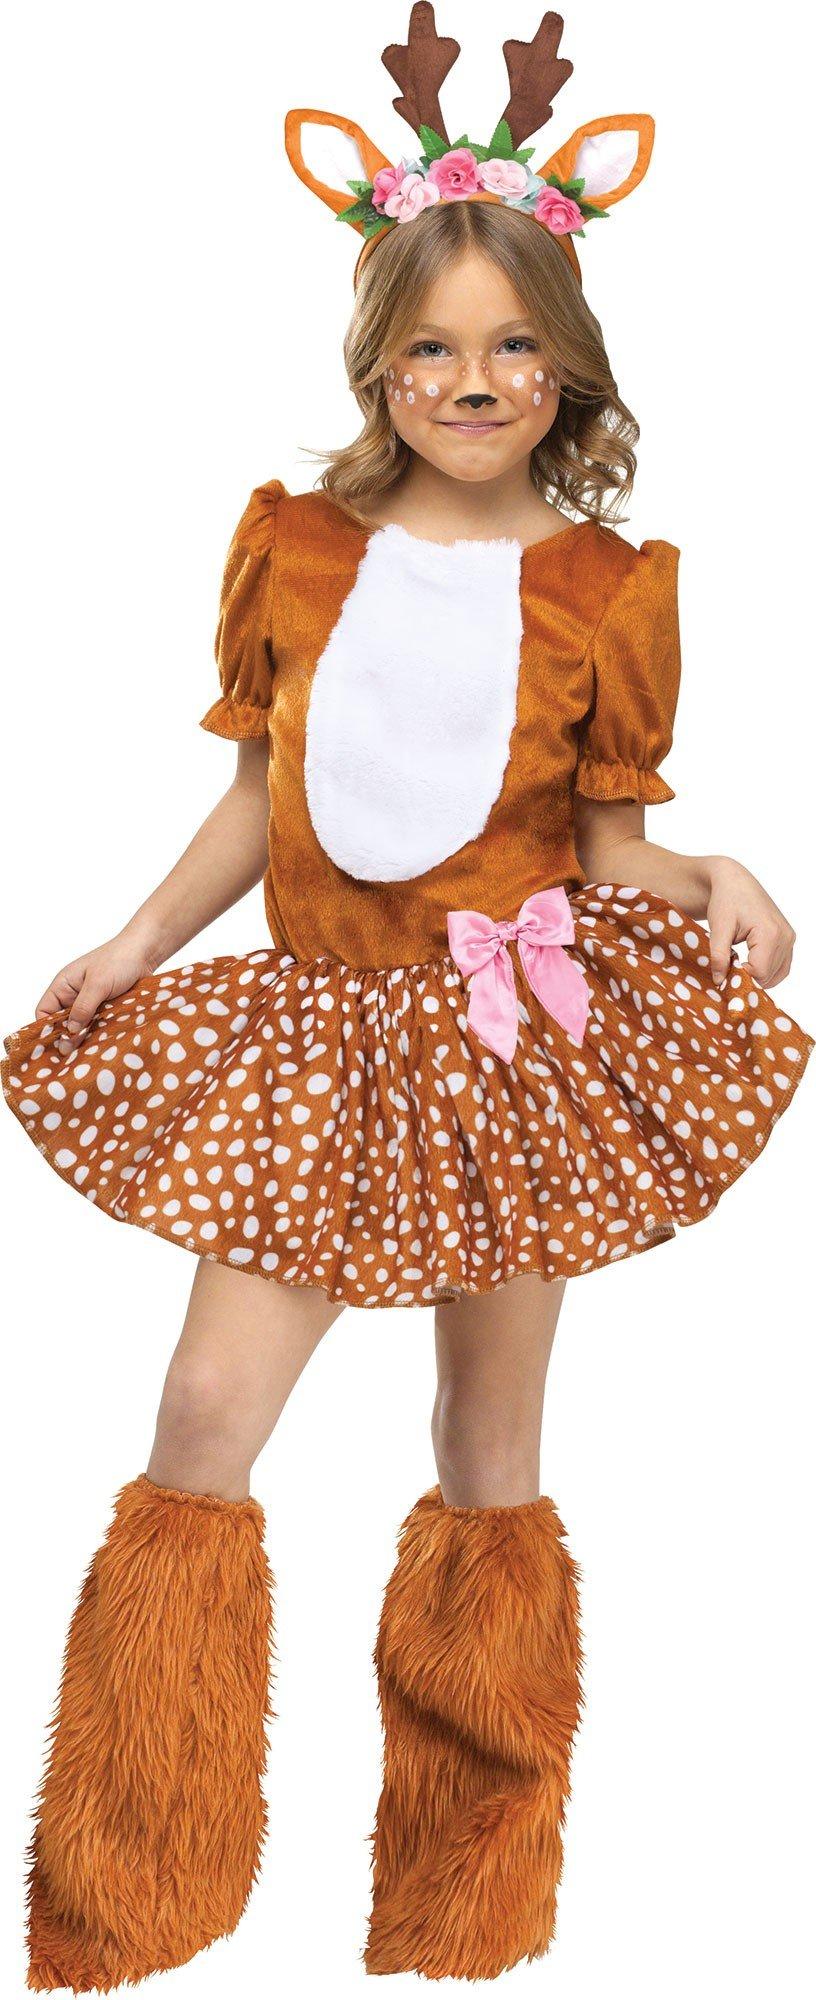 Fun World Girls Oh Deer Costume, Brown, Large 12-14